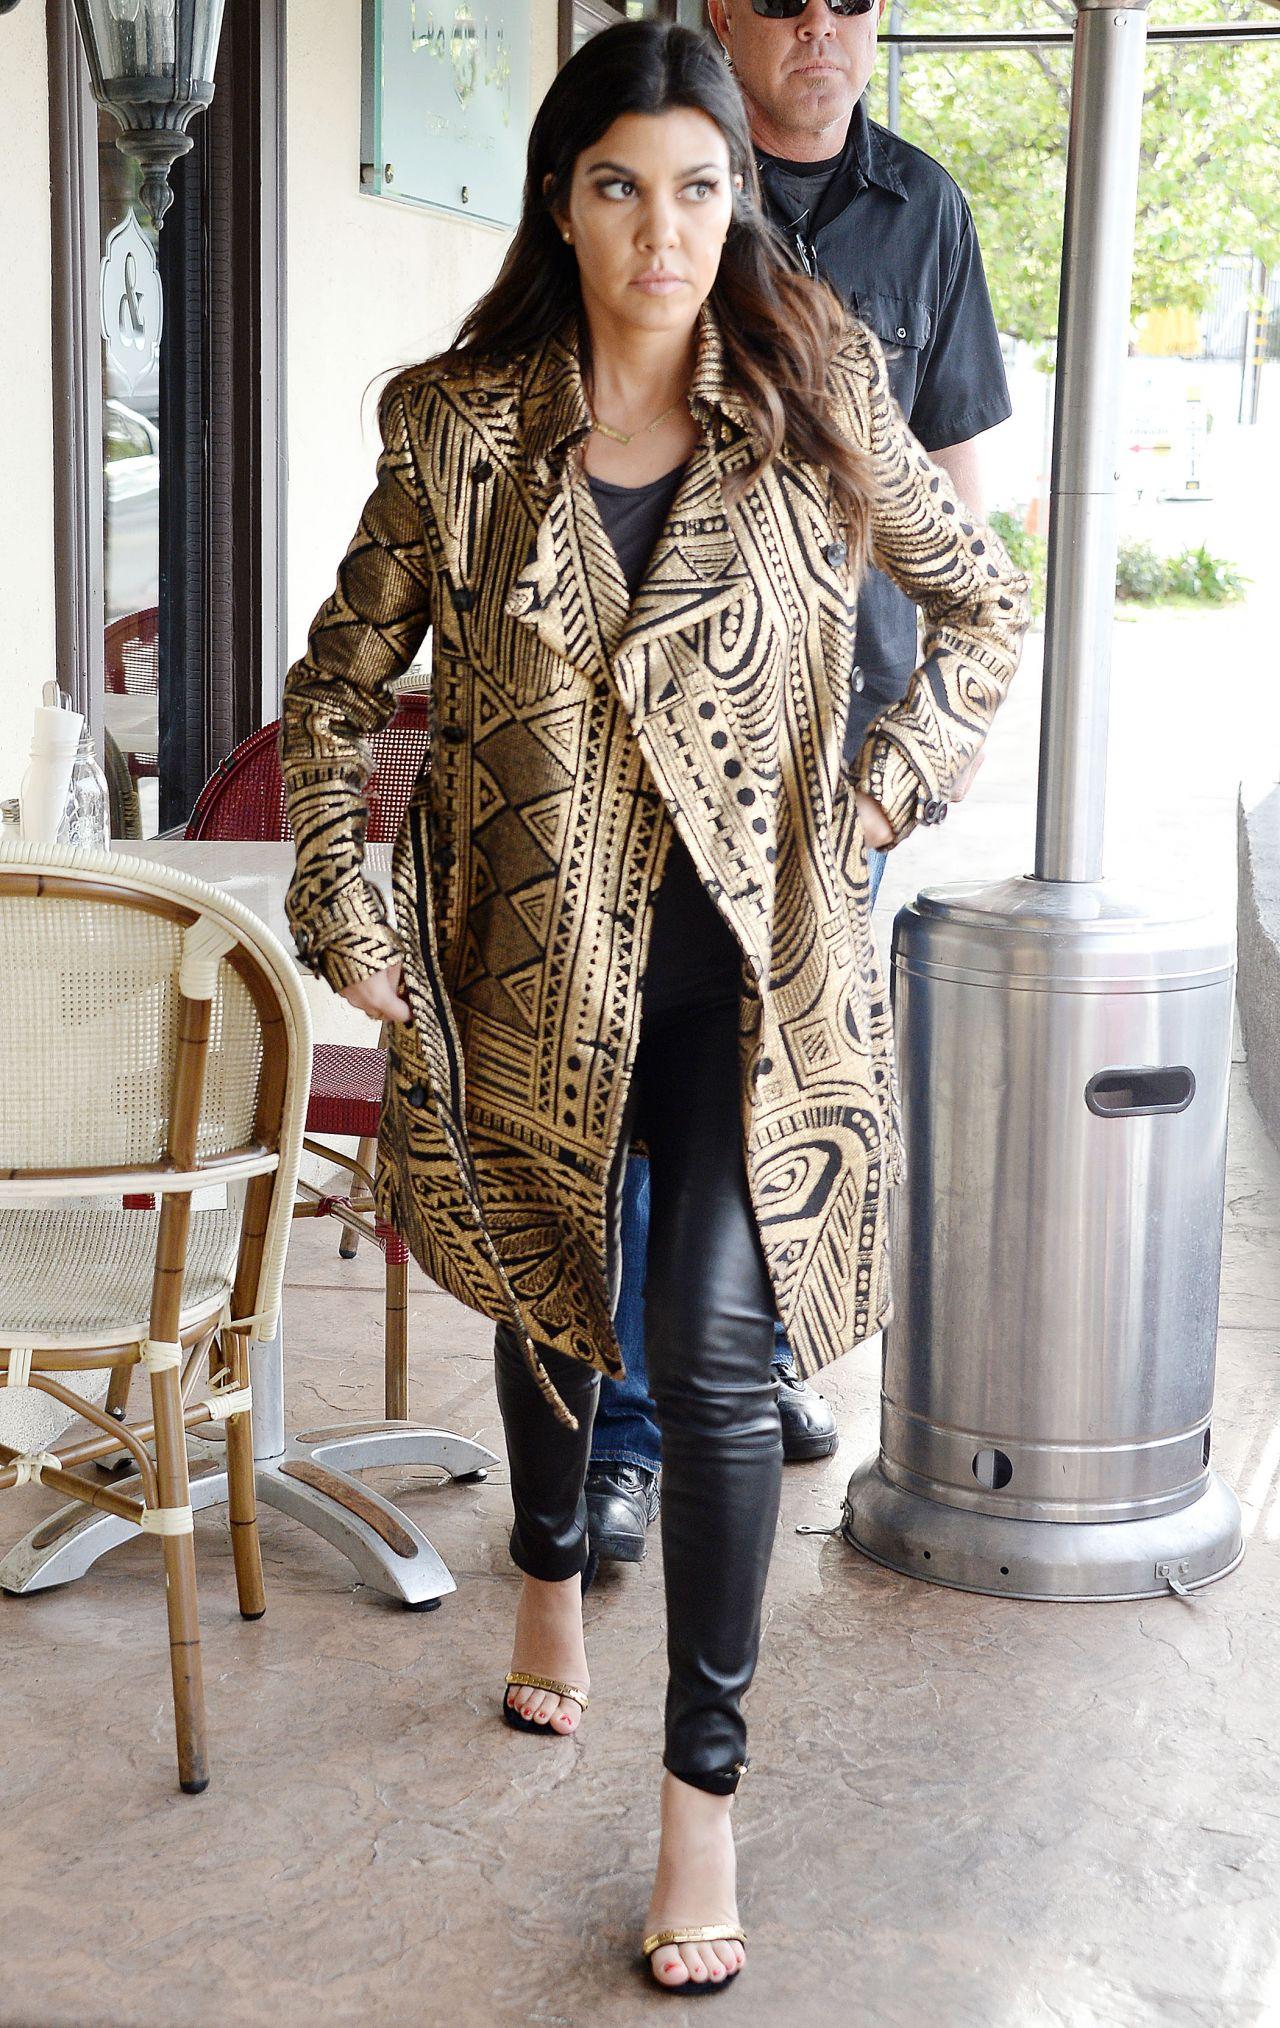 Khloe Kardashian And Kourtney Kardashian Woodland Hills January 2014